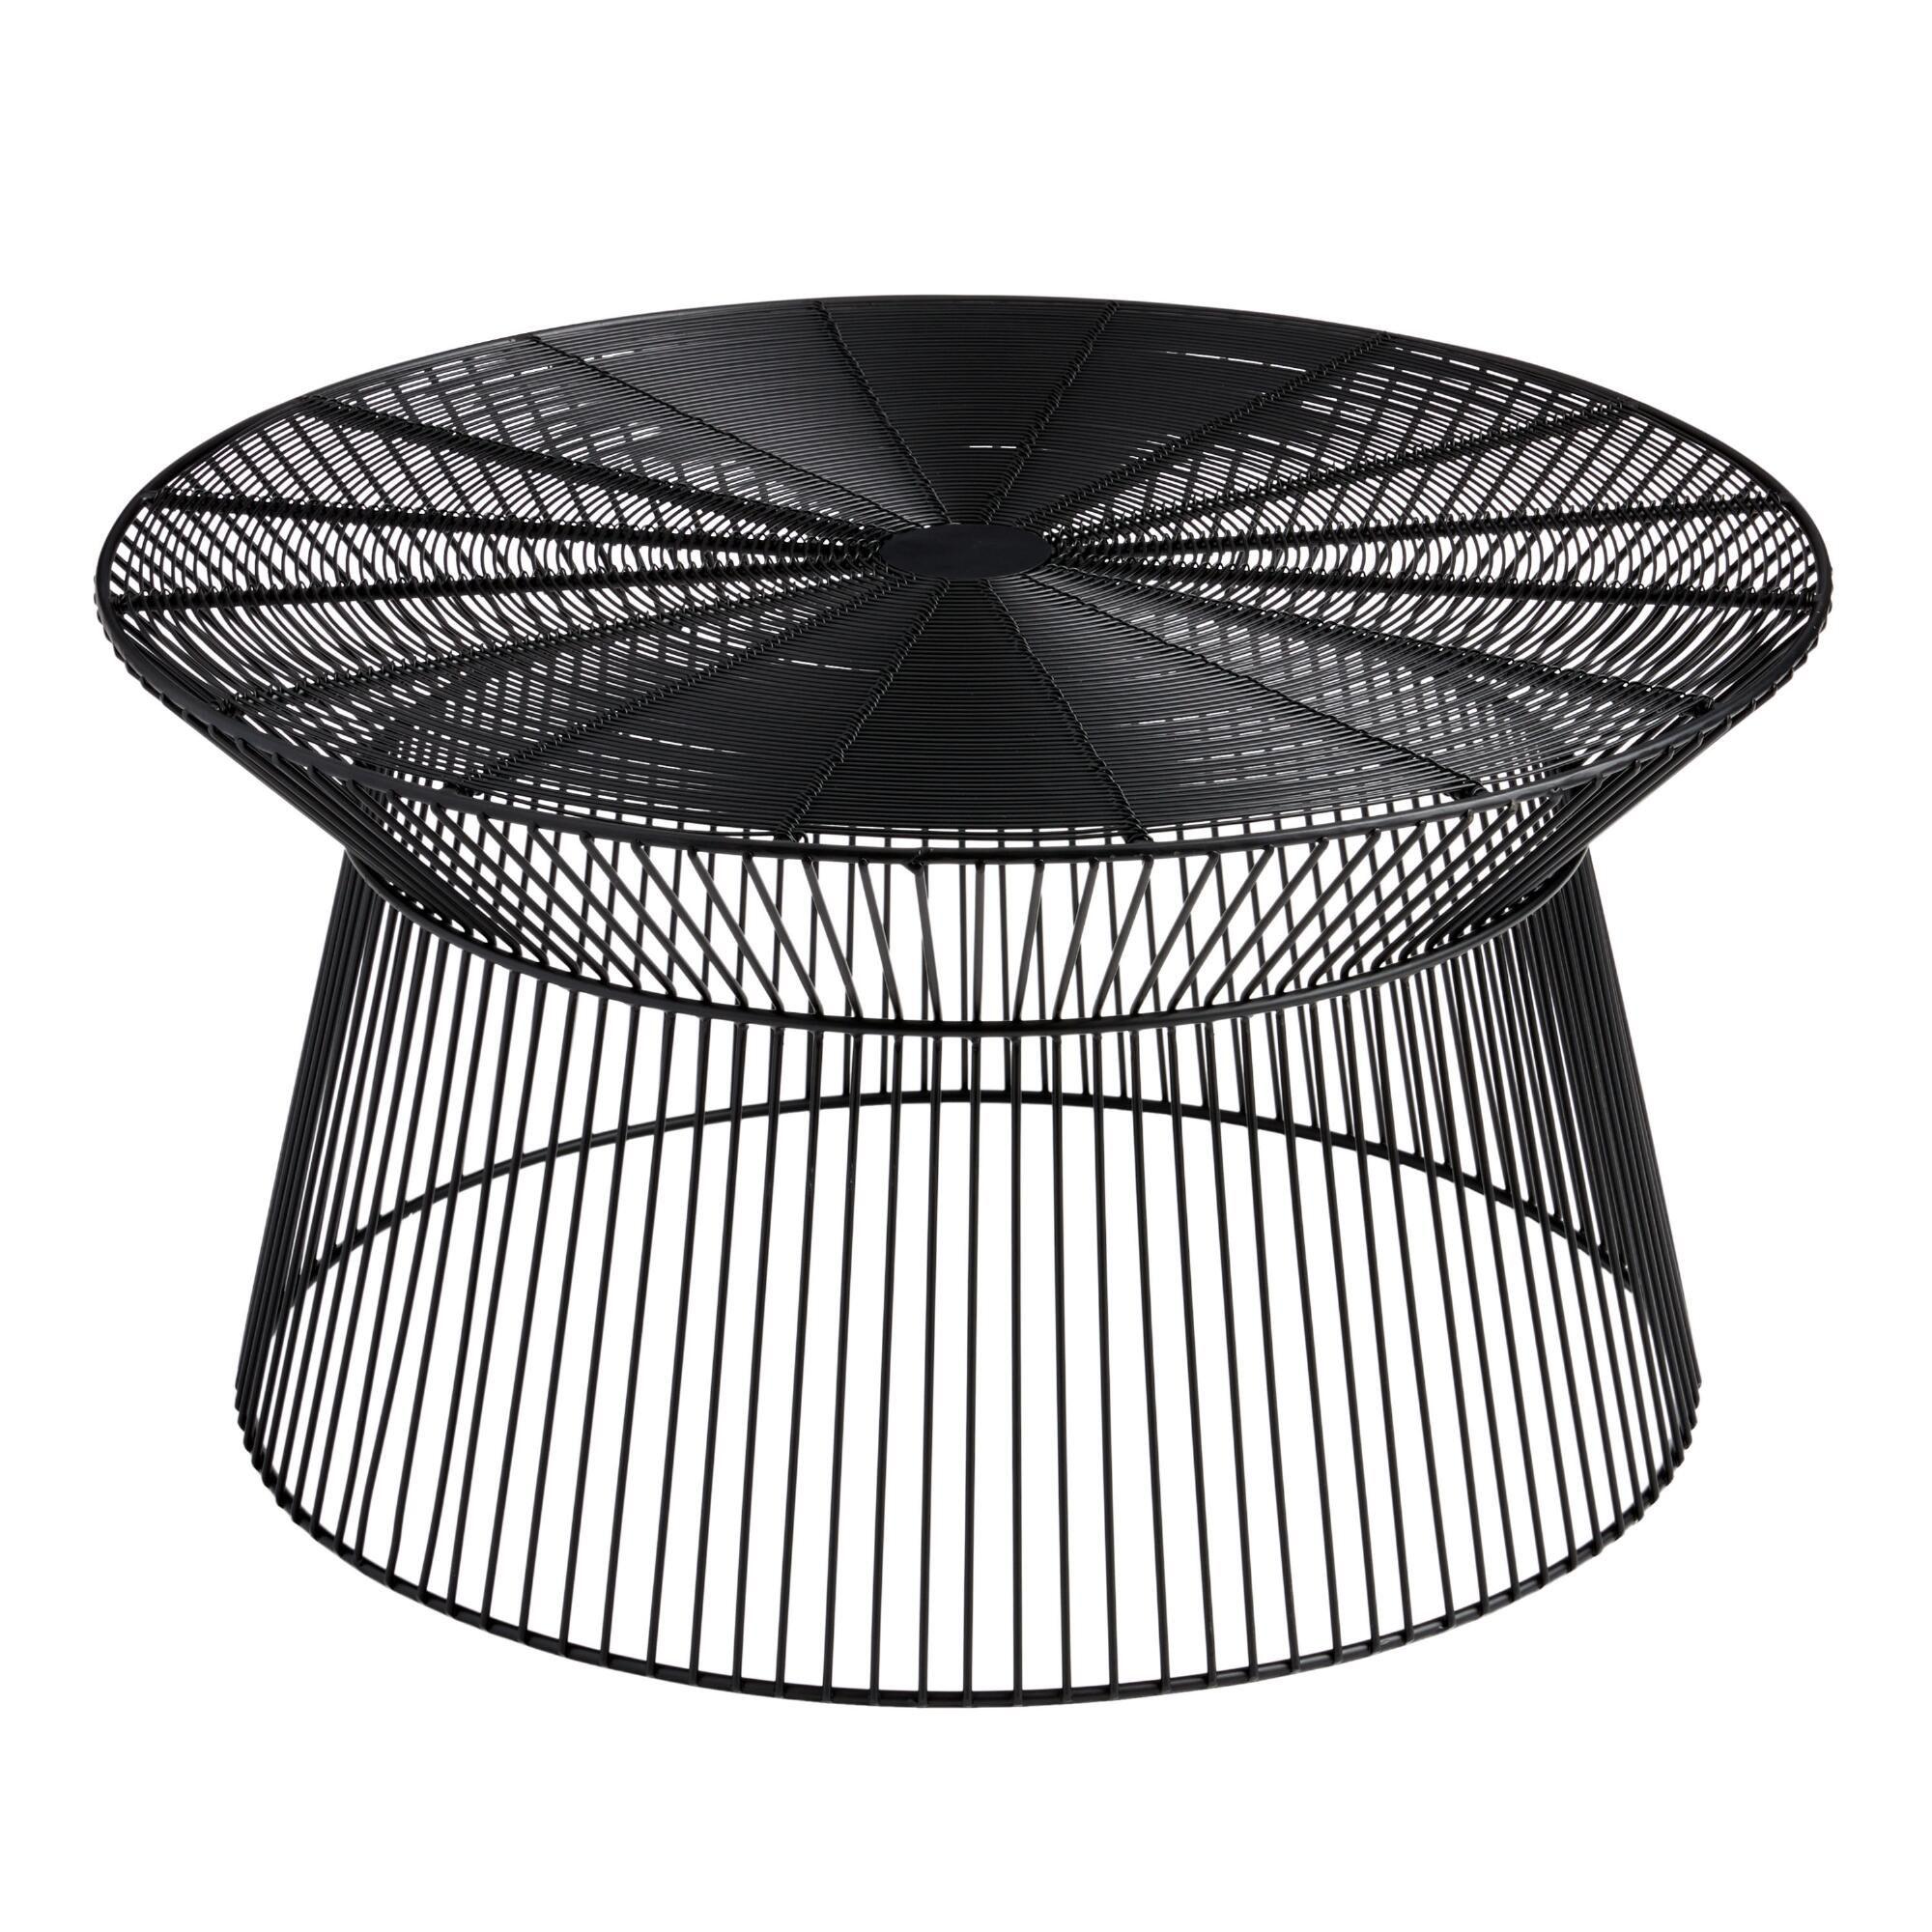 Round Black Metal Zeke Outdoor Coffee Table Outdoor Coffee Tables Metal Coffee Table Coffee Table [ 2000 x 2000 Pixel ]